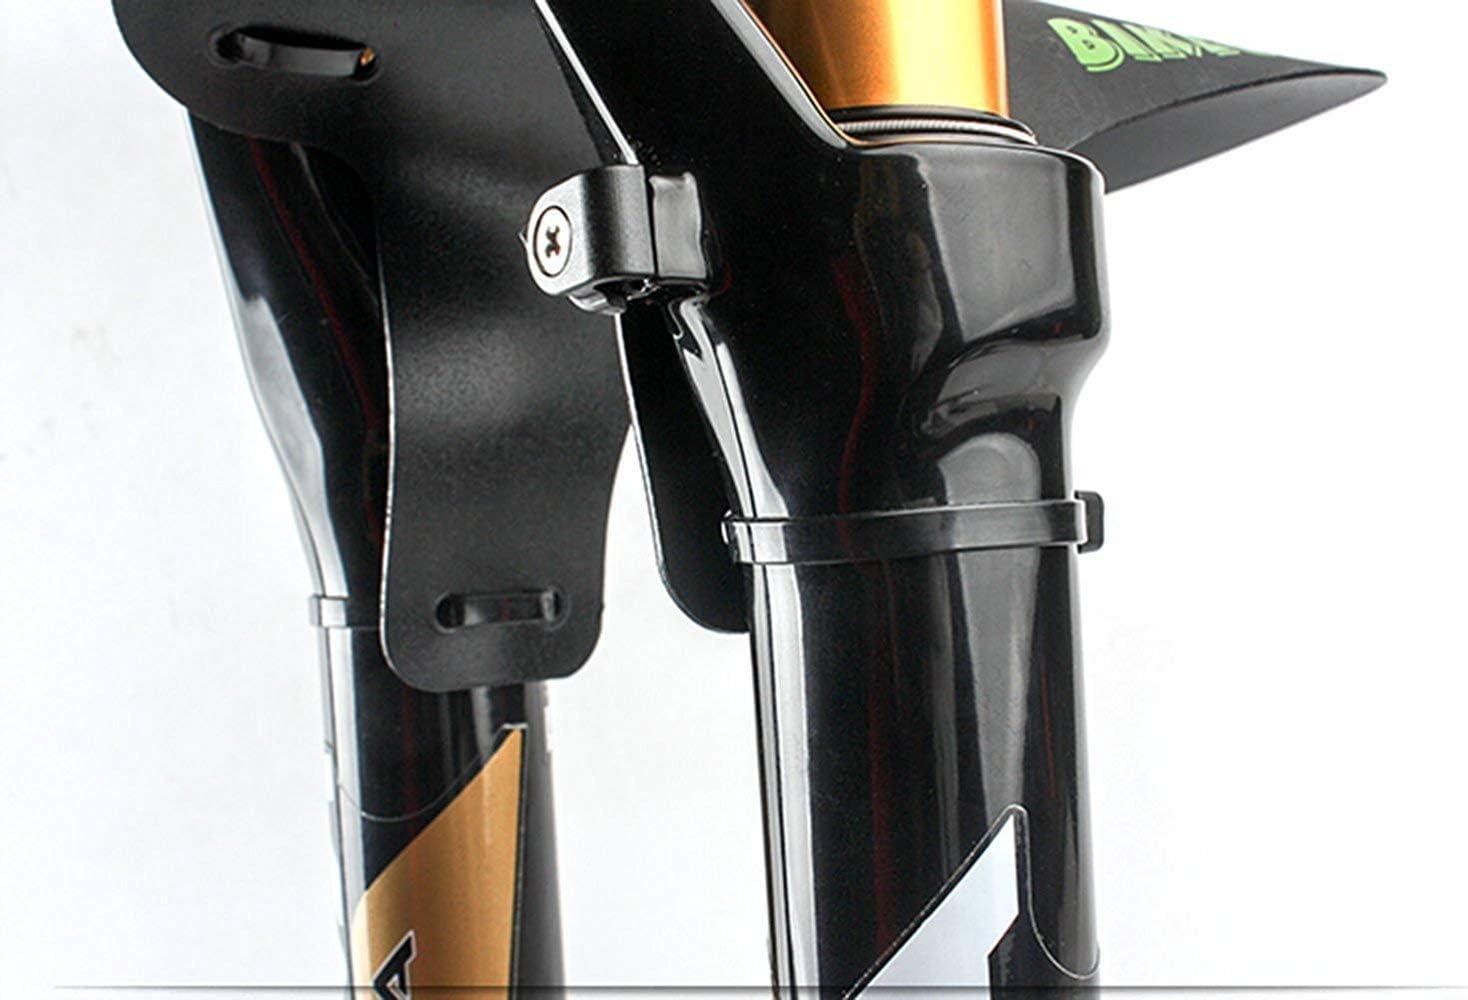 MTB Bike Mudguard,Mountain Bicycle Fenders Lightweight Adjustable MTB Mud Guard Bicycle Mud Guard Fenders for 24 26 29 Size Mountain Bike Cycling Bike